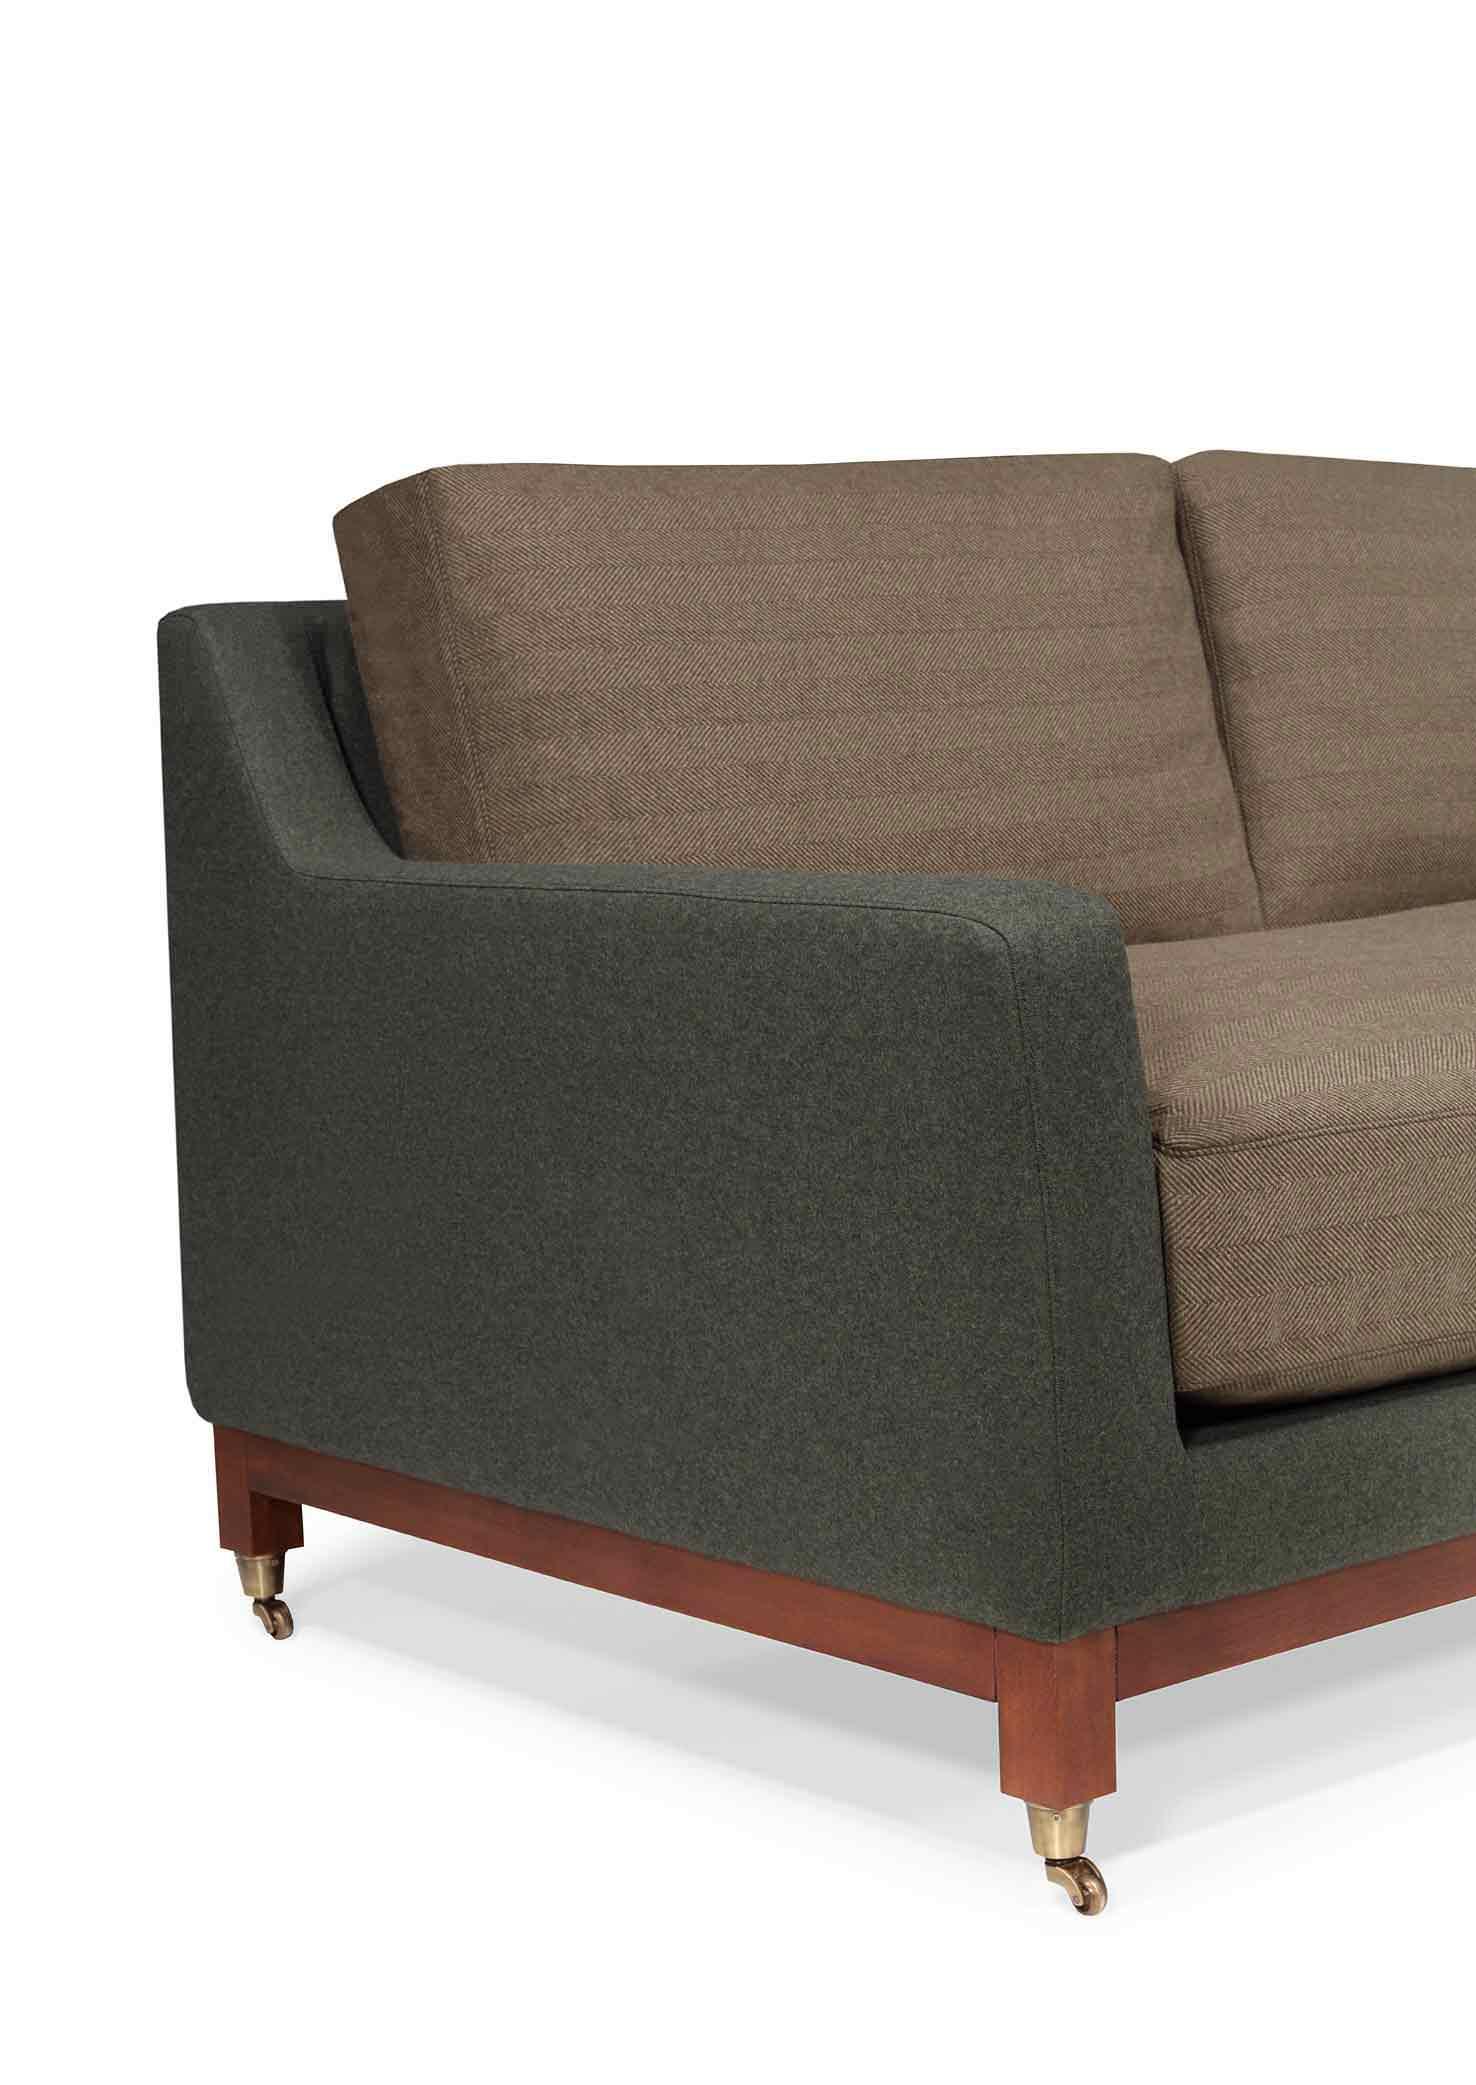 Fabulous Classic Sofa With A Twist Products Kassavello Inzonedesignstudio Interior Chair Design Inzonedesignstudiocom